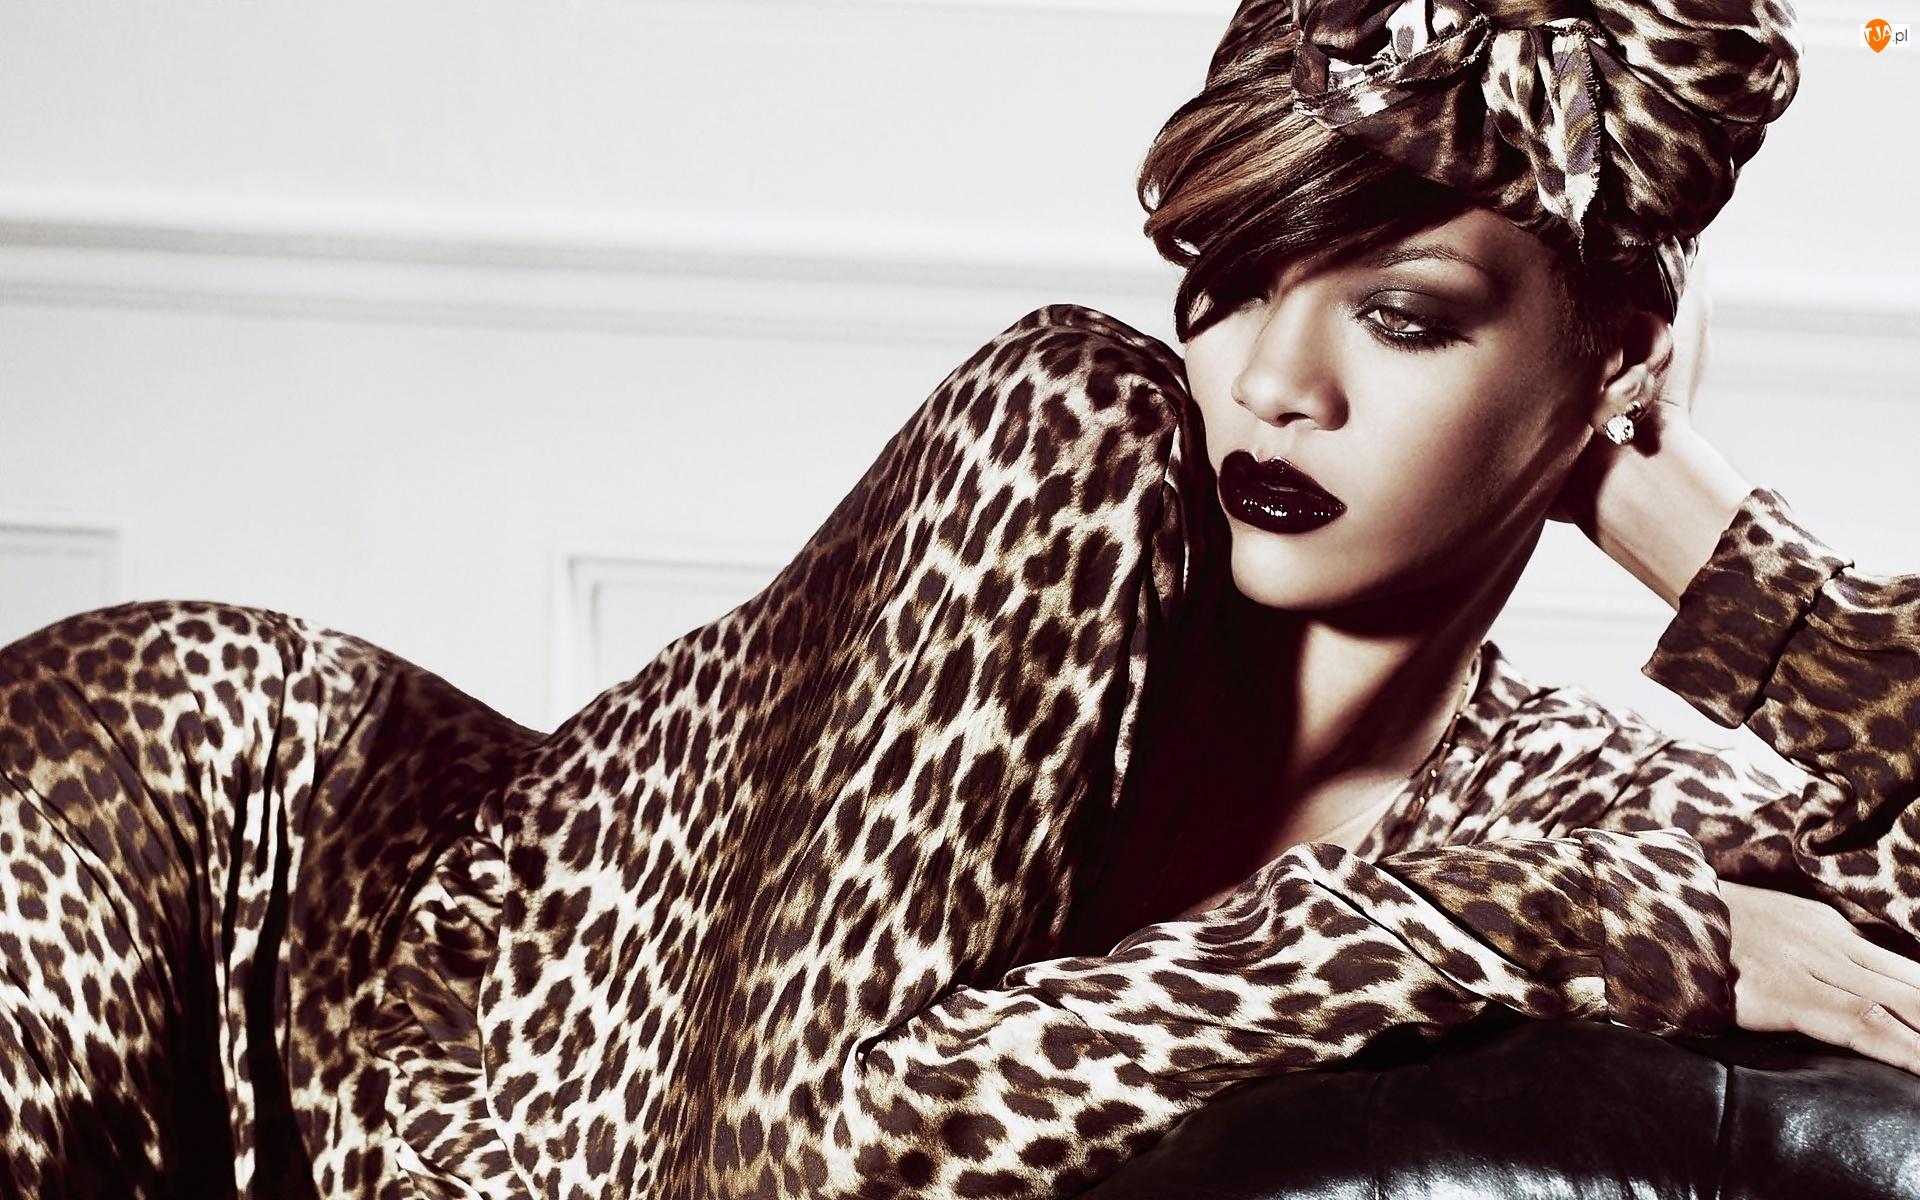 Makijaż, Robyn Rihanna Fenty, Rihanna